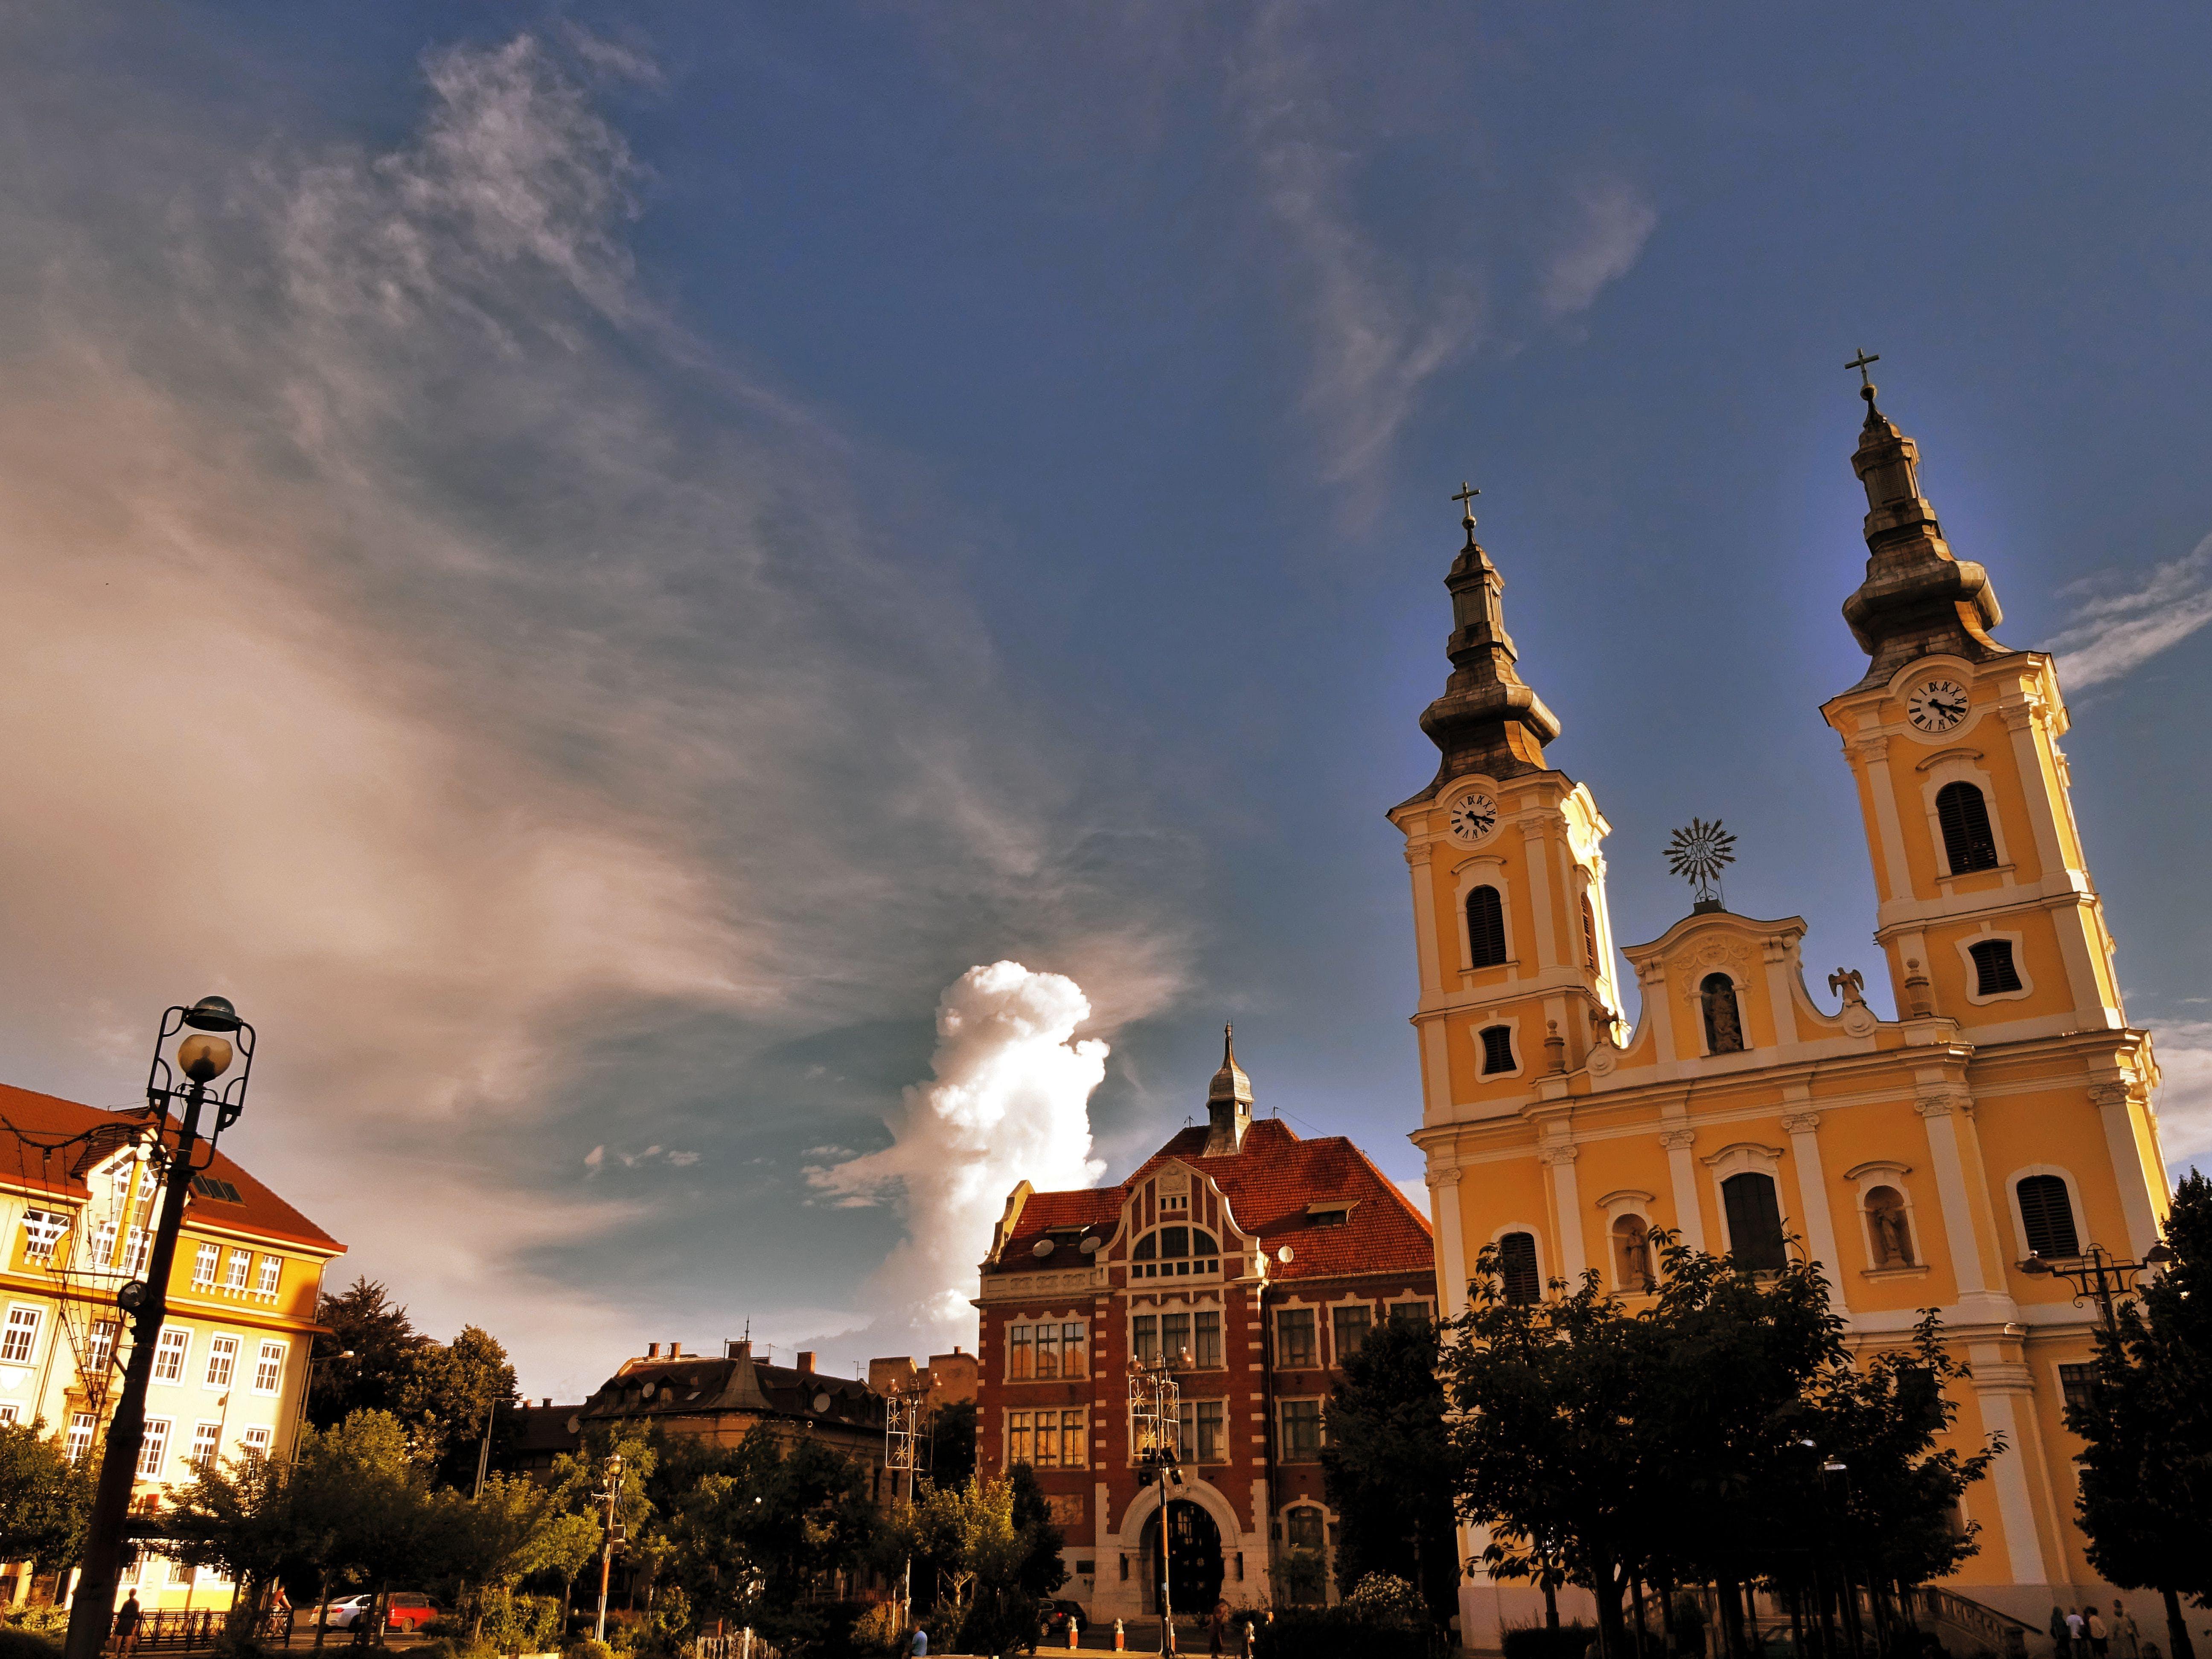 Cathedral Beside Building Under Blue Sky